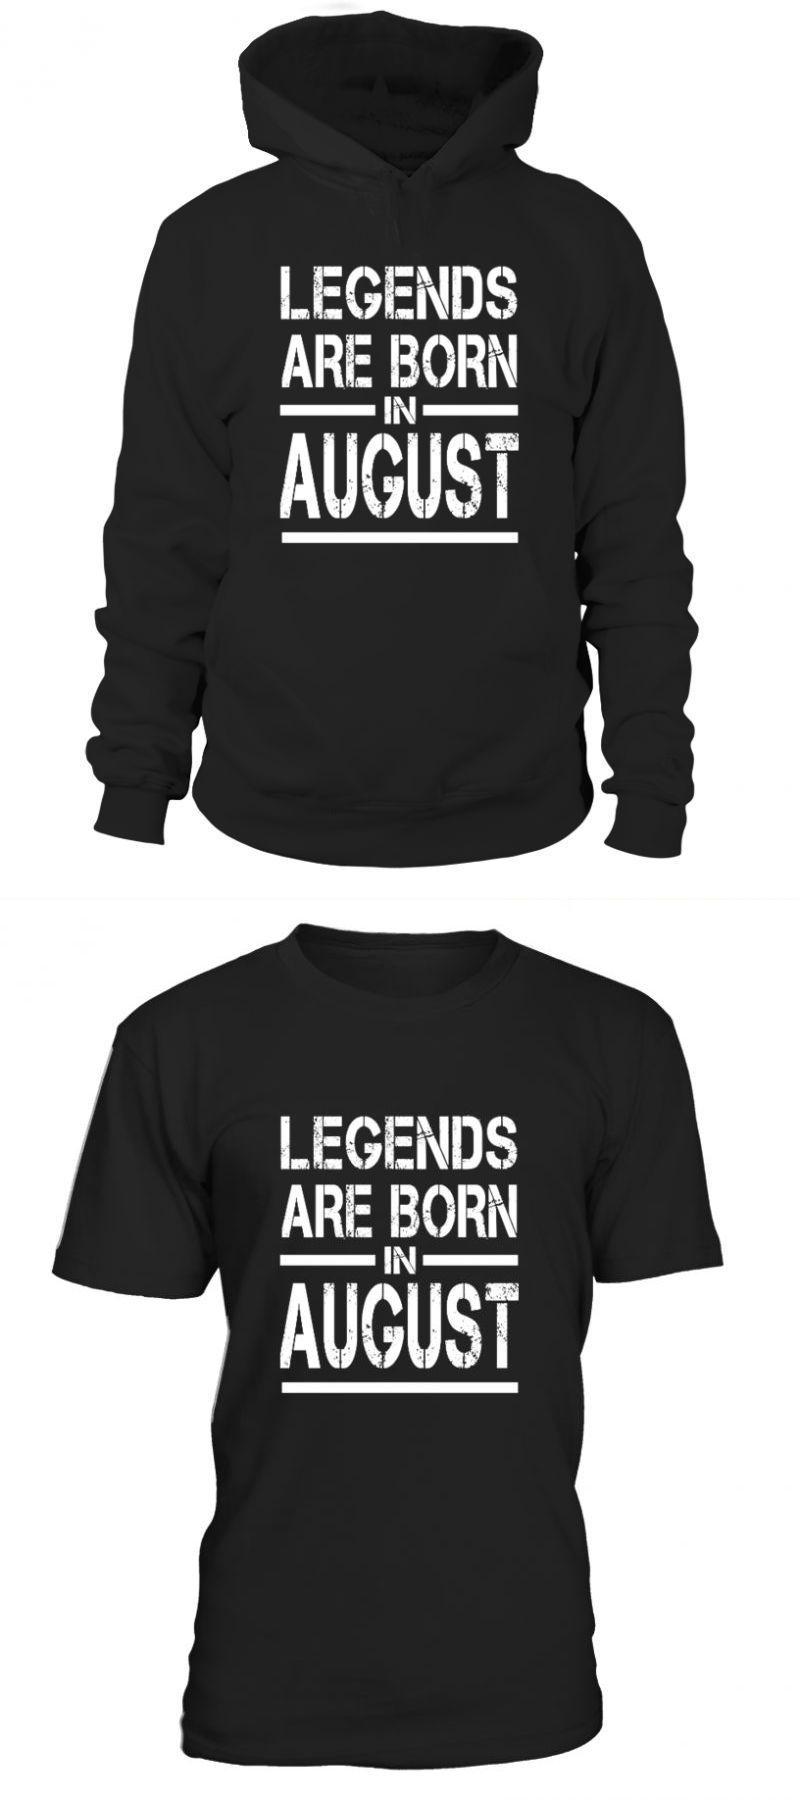 96741ea14 Men s basketball t shirt legends are born in august basketball wives t shirt  drama  men s  basketball  shirt  legends  are  born  in  august  wives   drama ...